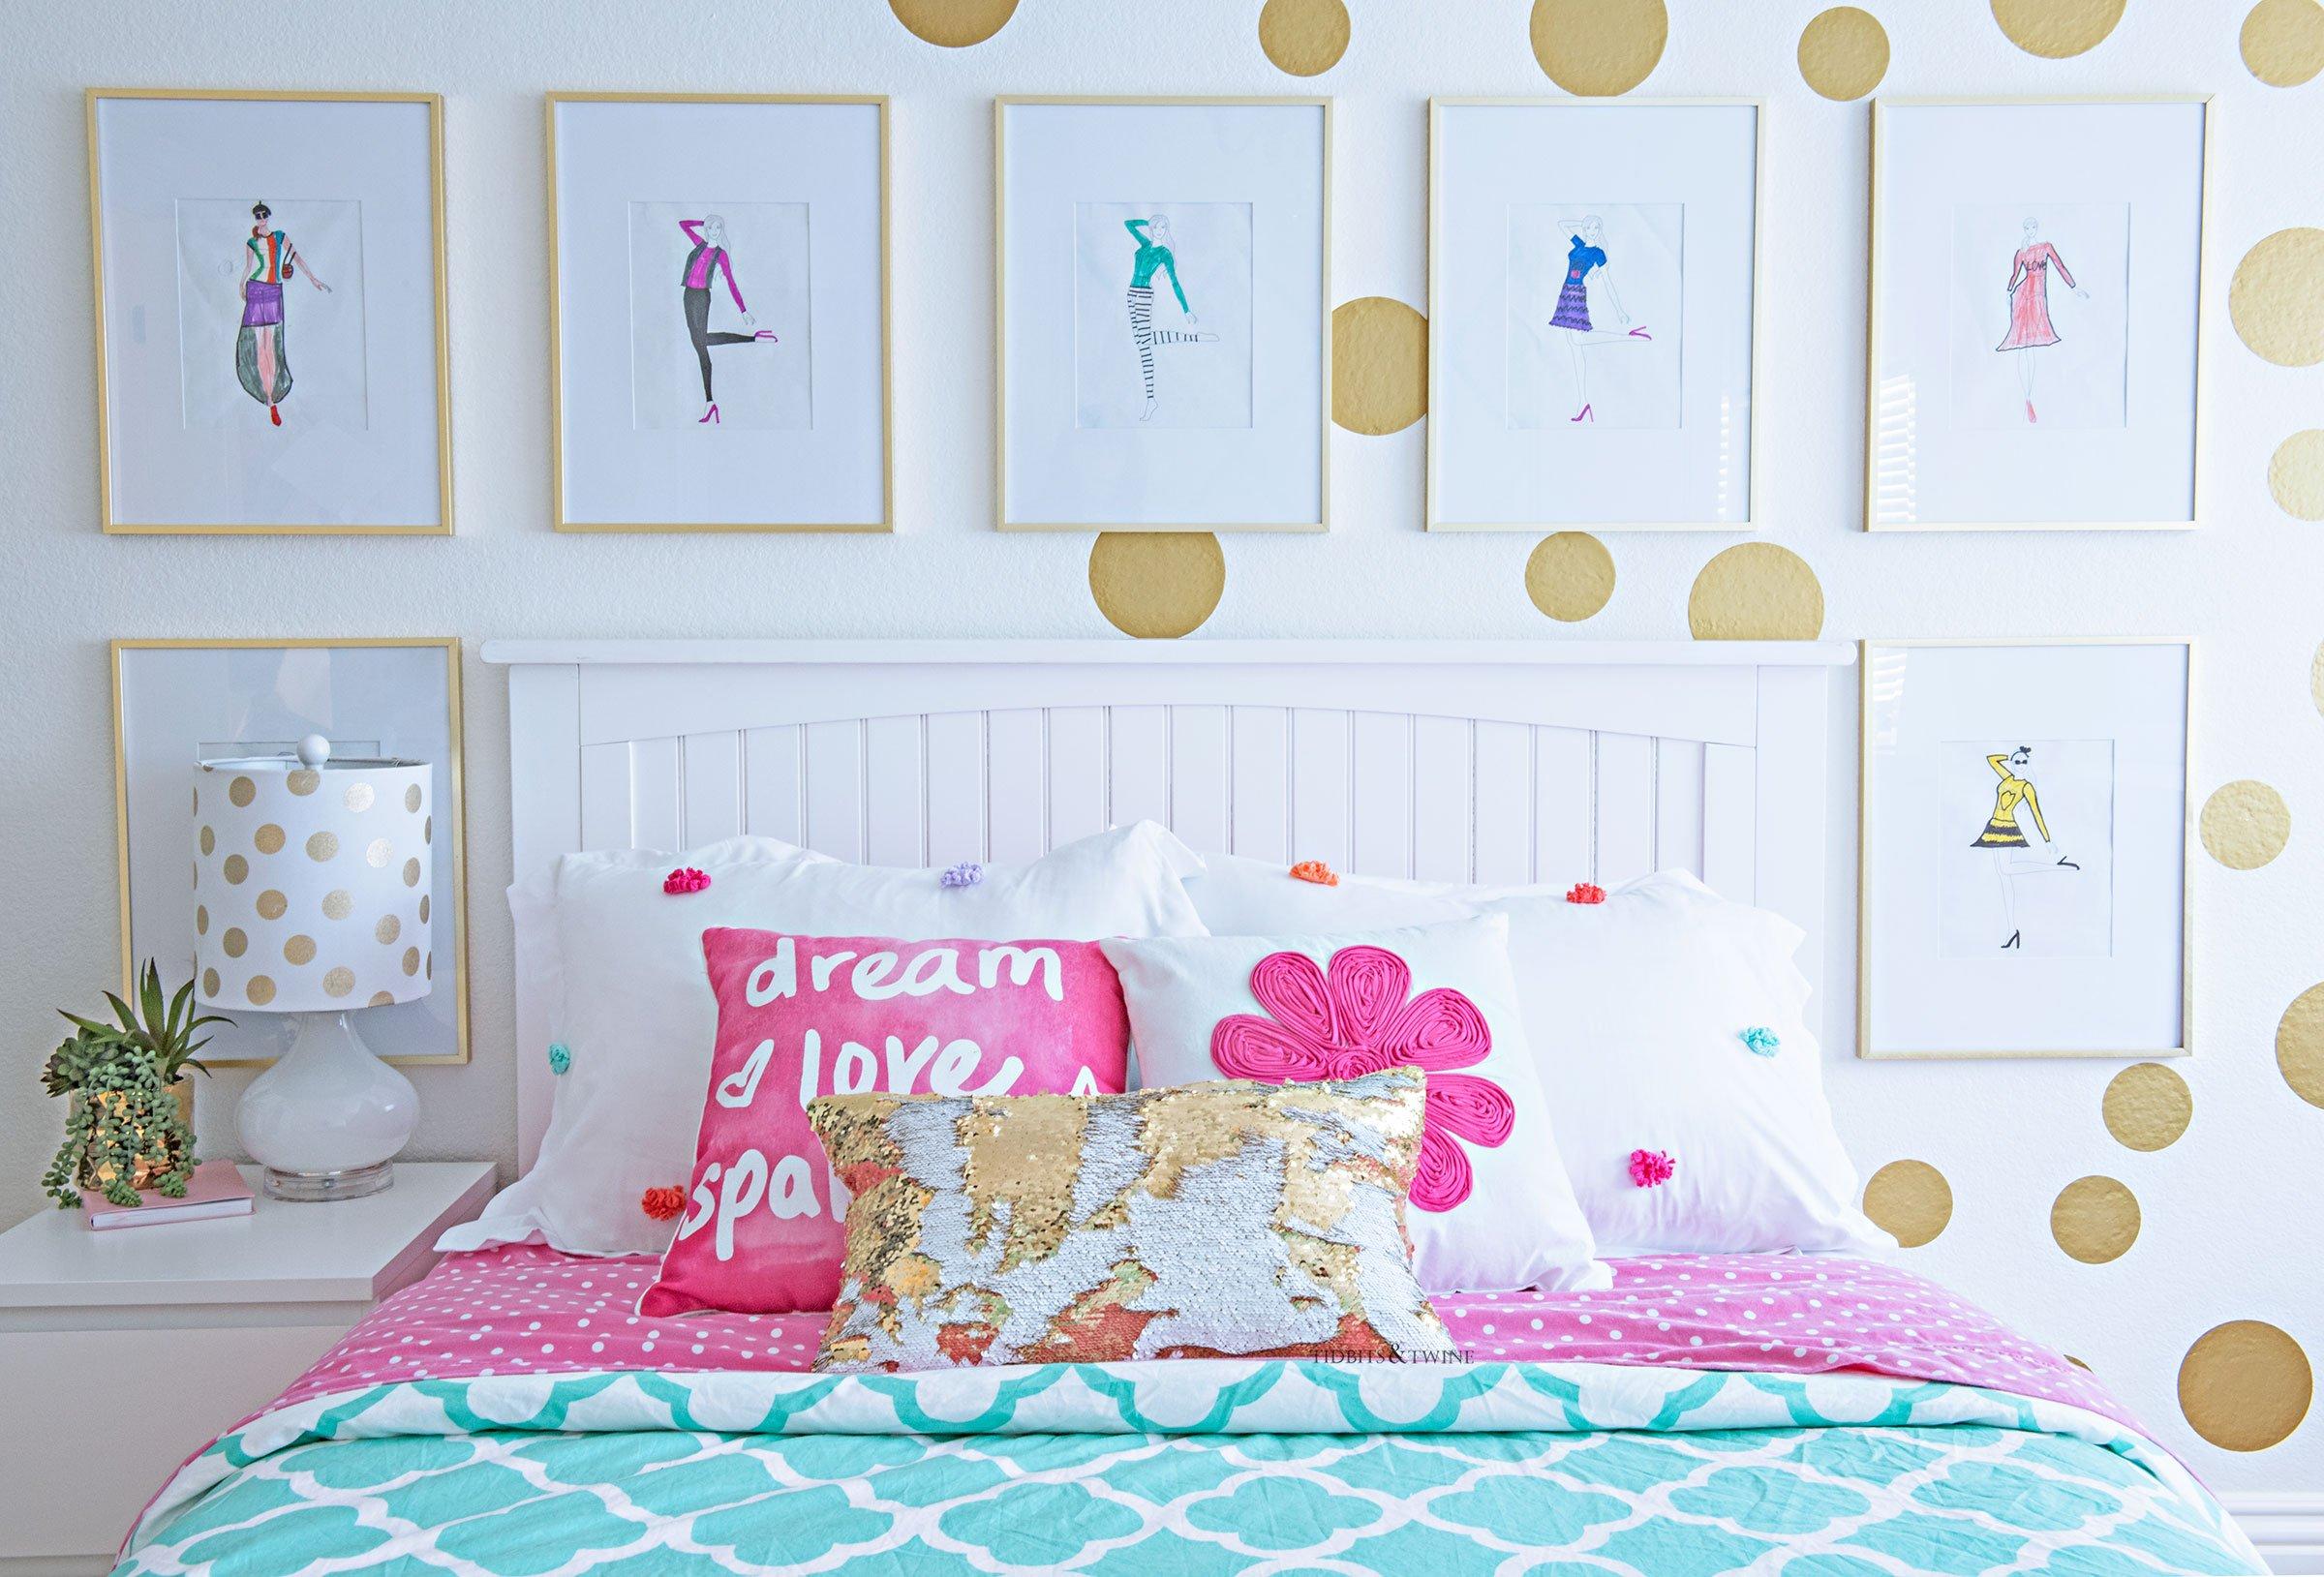 Teen Tween Girls Bedroom Makeover Idea On A Budget Tidbits Twine